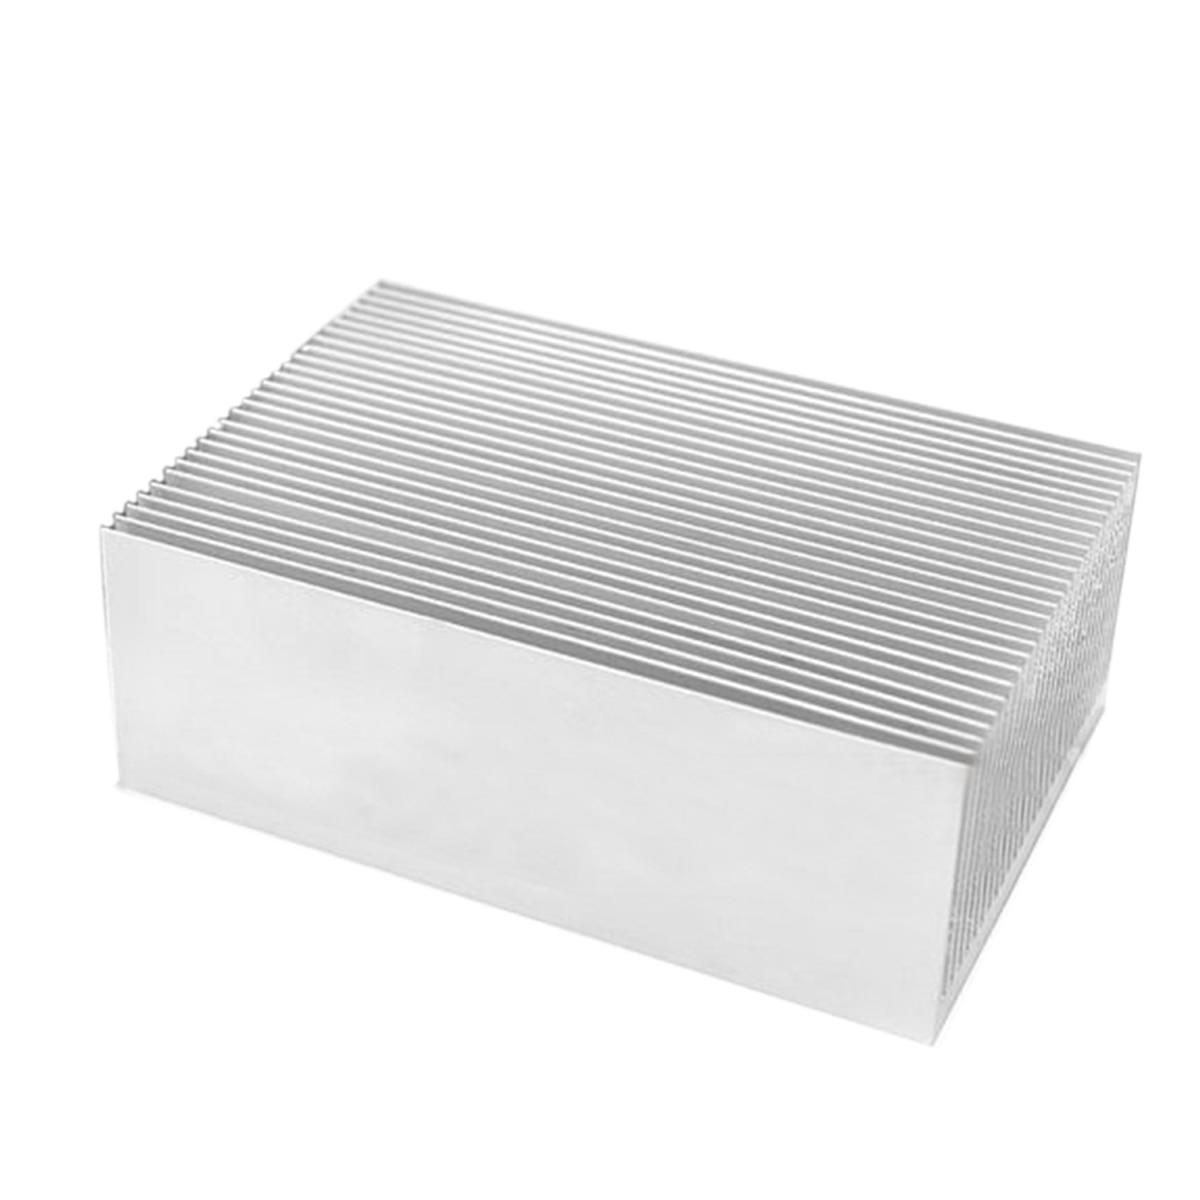 1pc Large Big DIY Aluminum Heatsink Cooler Mayitr Heat Sink Radiator for Led High Power Amplifier Transistor high quality pure copper heatsink 100x40x10mm skiving fin diy heat sink radiator for electronic chip led ic ram cooling cooler